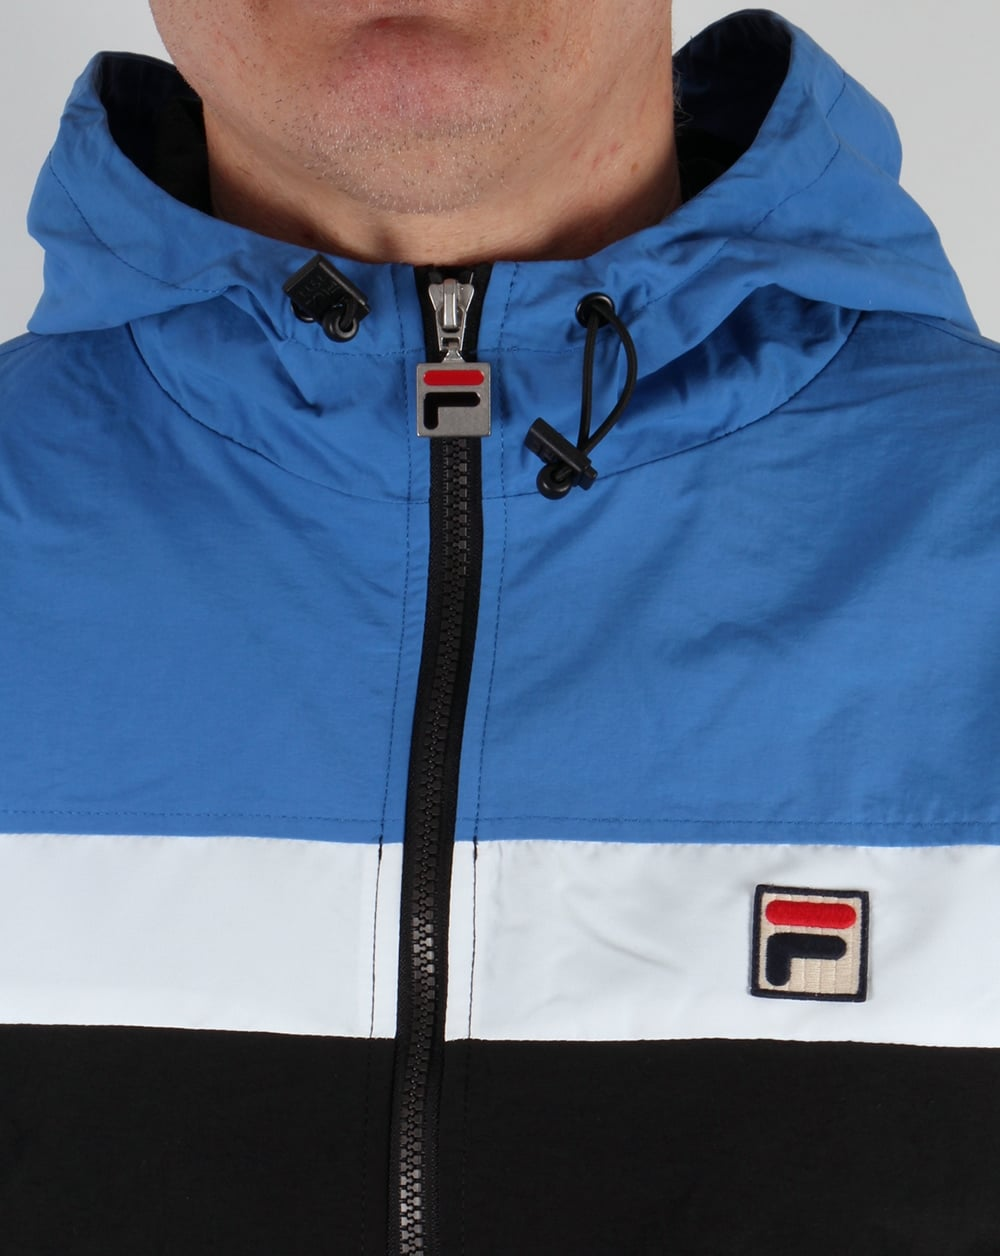 92d72b3b1dcbb Fila Vintage Clipper Jacket Black/Ocean/White